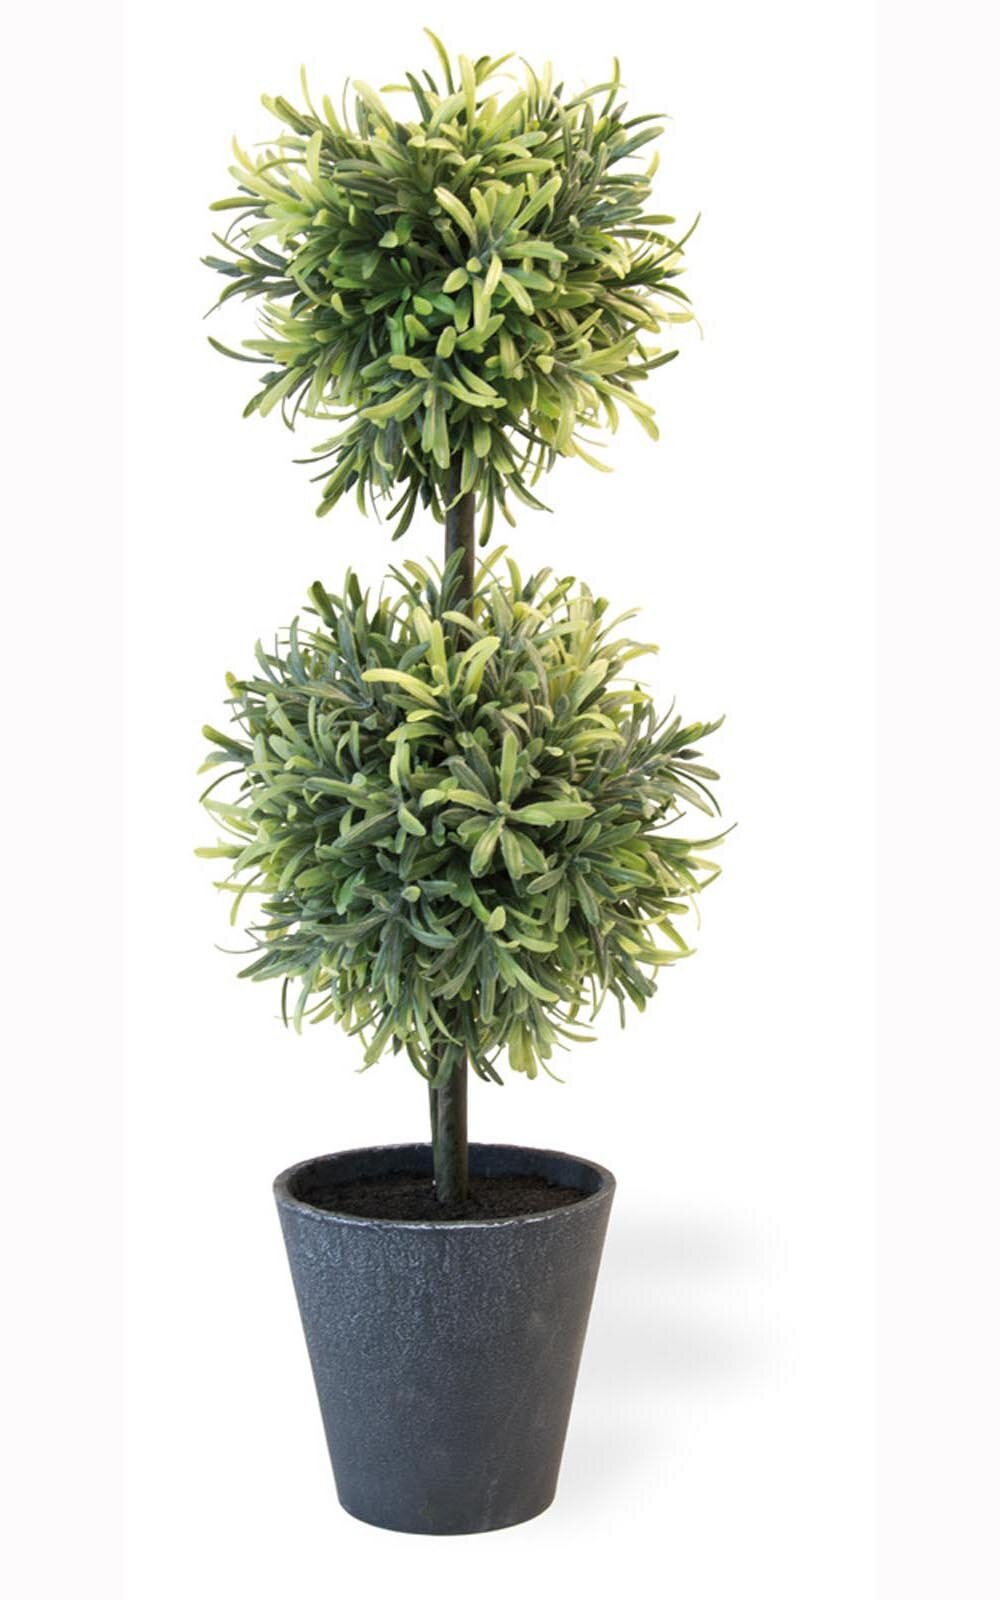 Fleur De Lis Living Rosemary Ball Topiary Herbs In Pot Reviews Wayfair